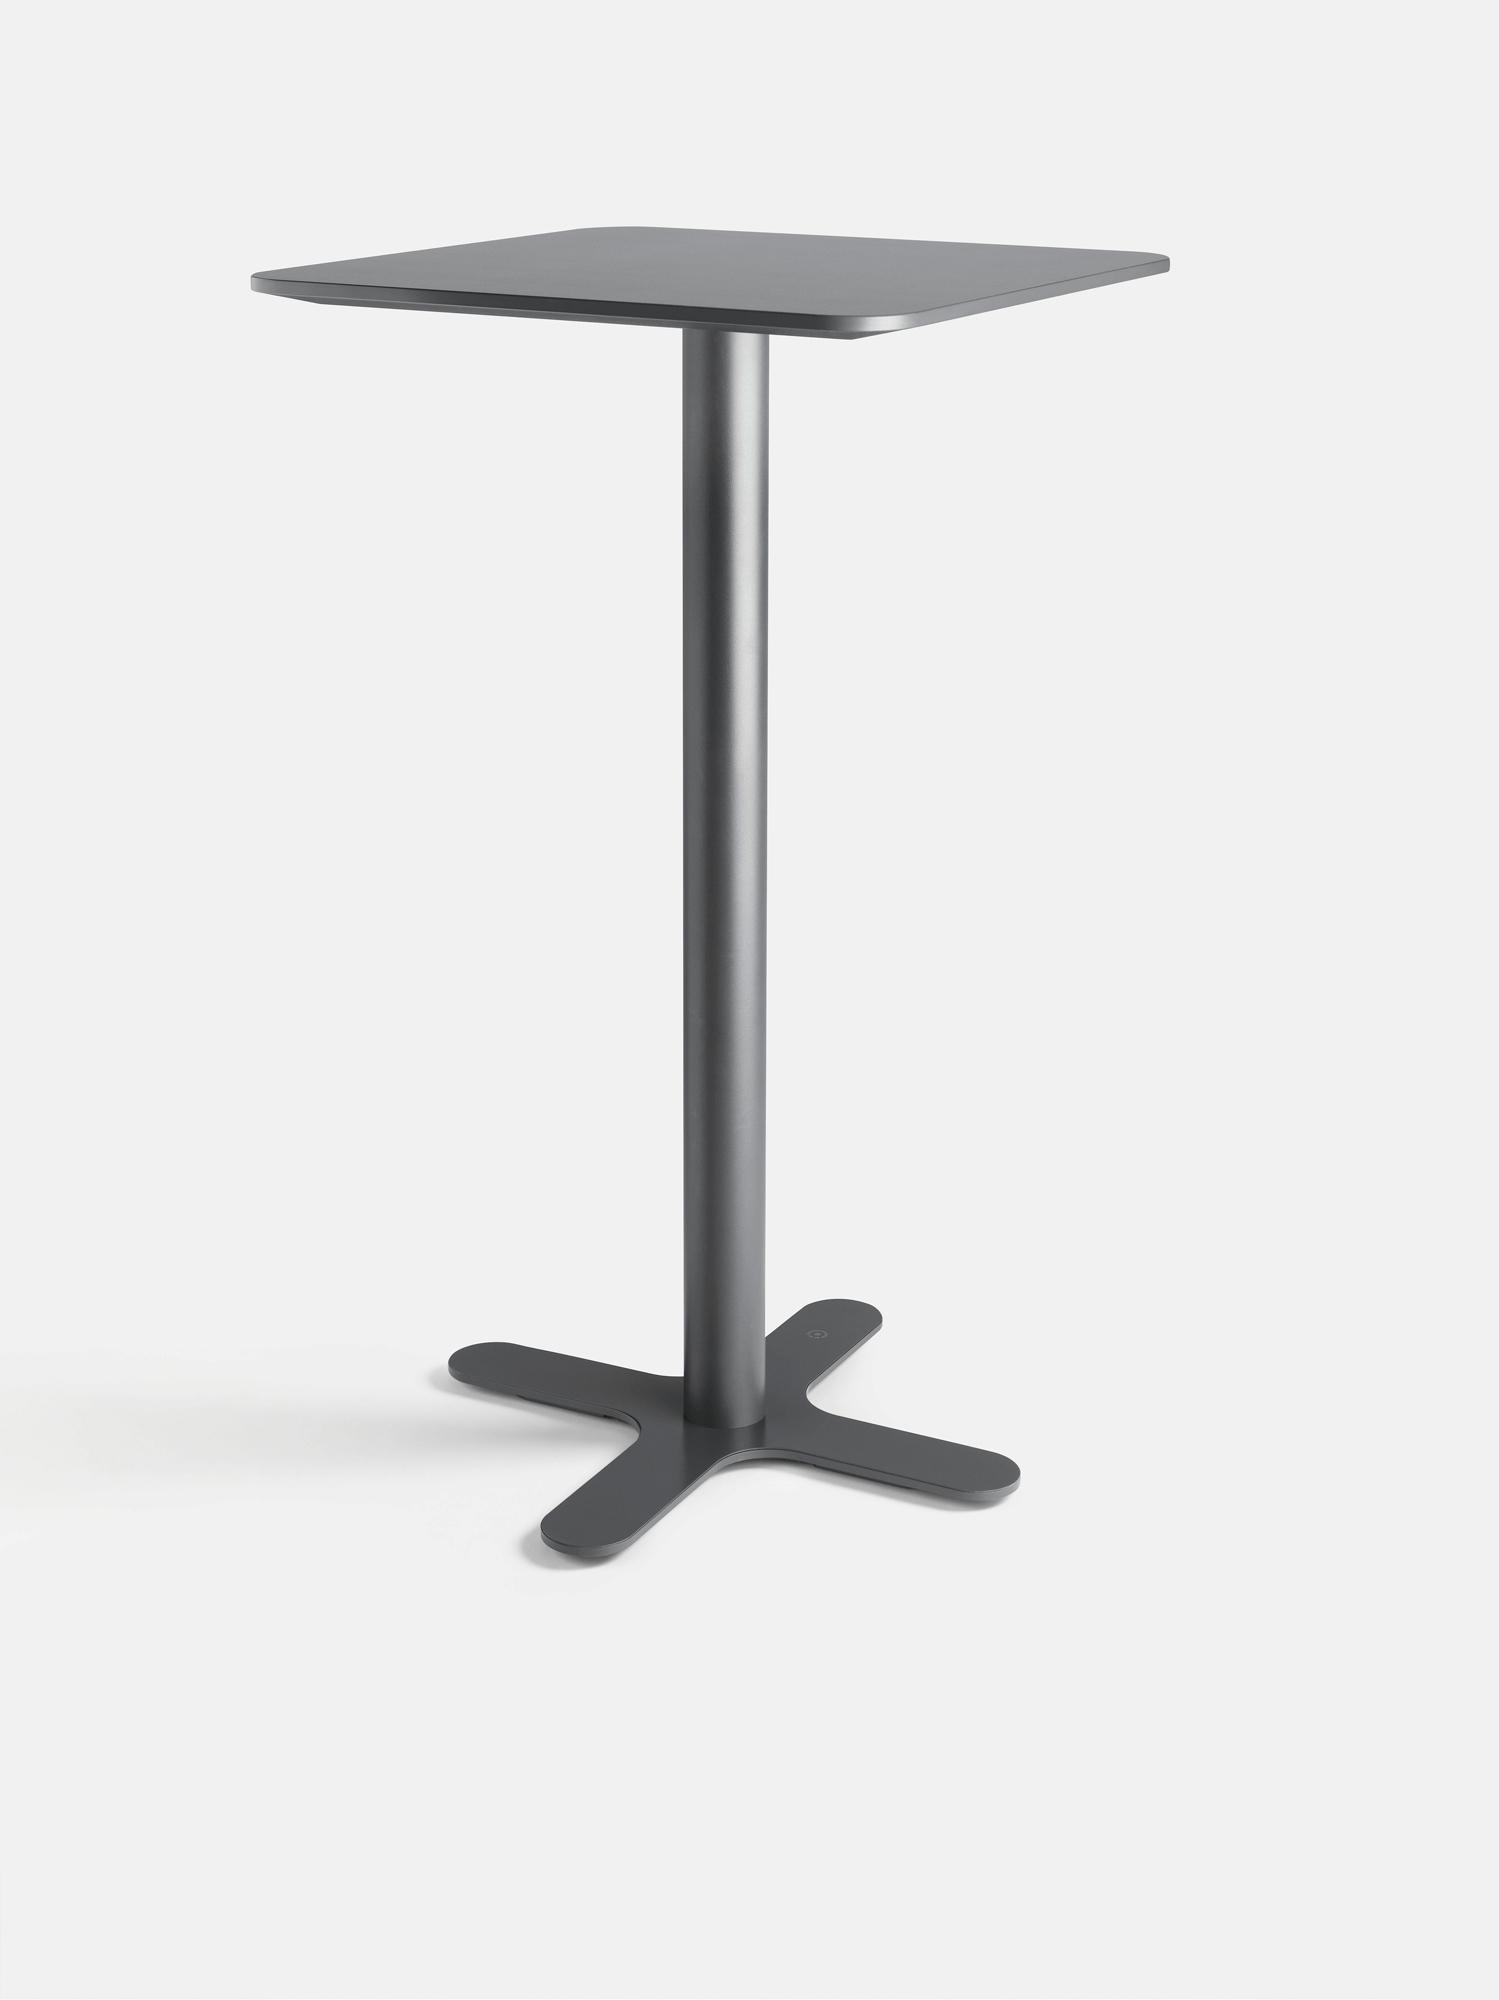 4250660206625_1-fritz-mocnik-stehtisch-mesami-stehtisch Unique De Table De Bar Avec Rangement Schème